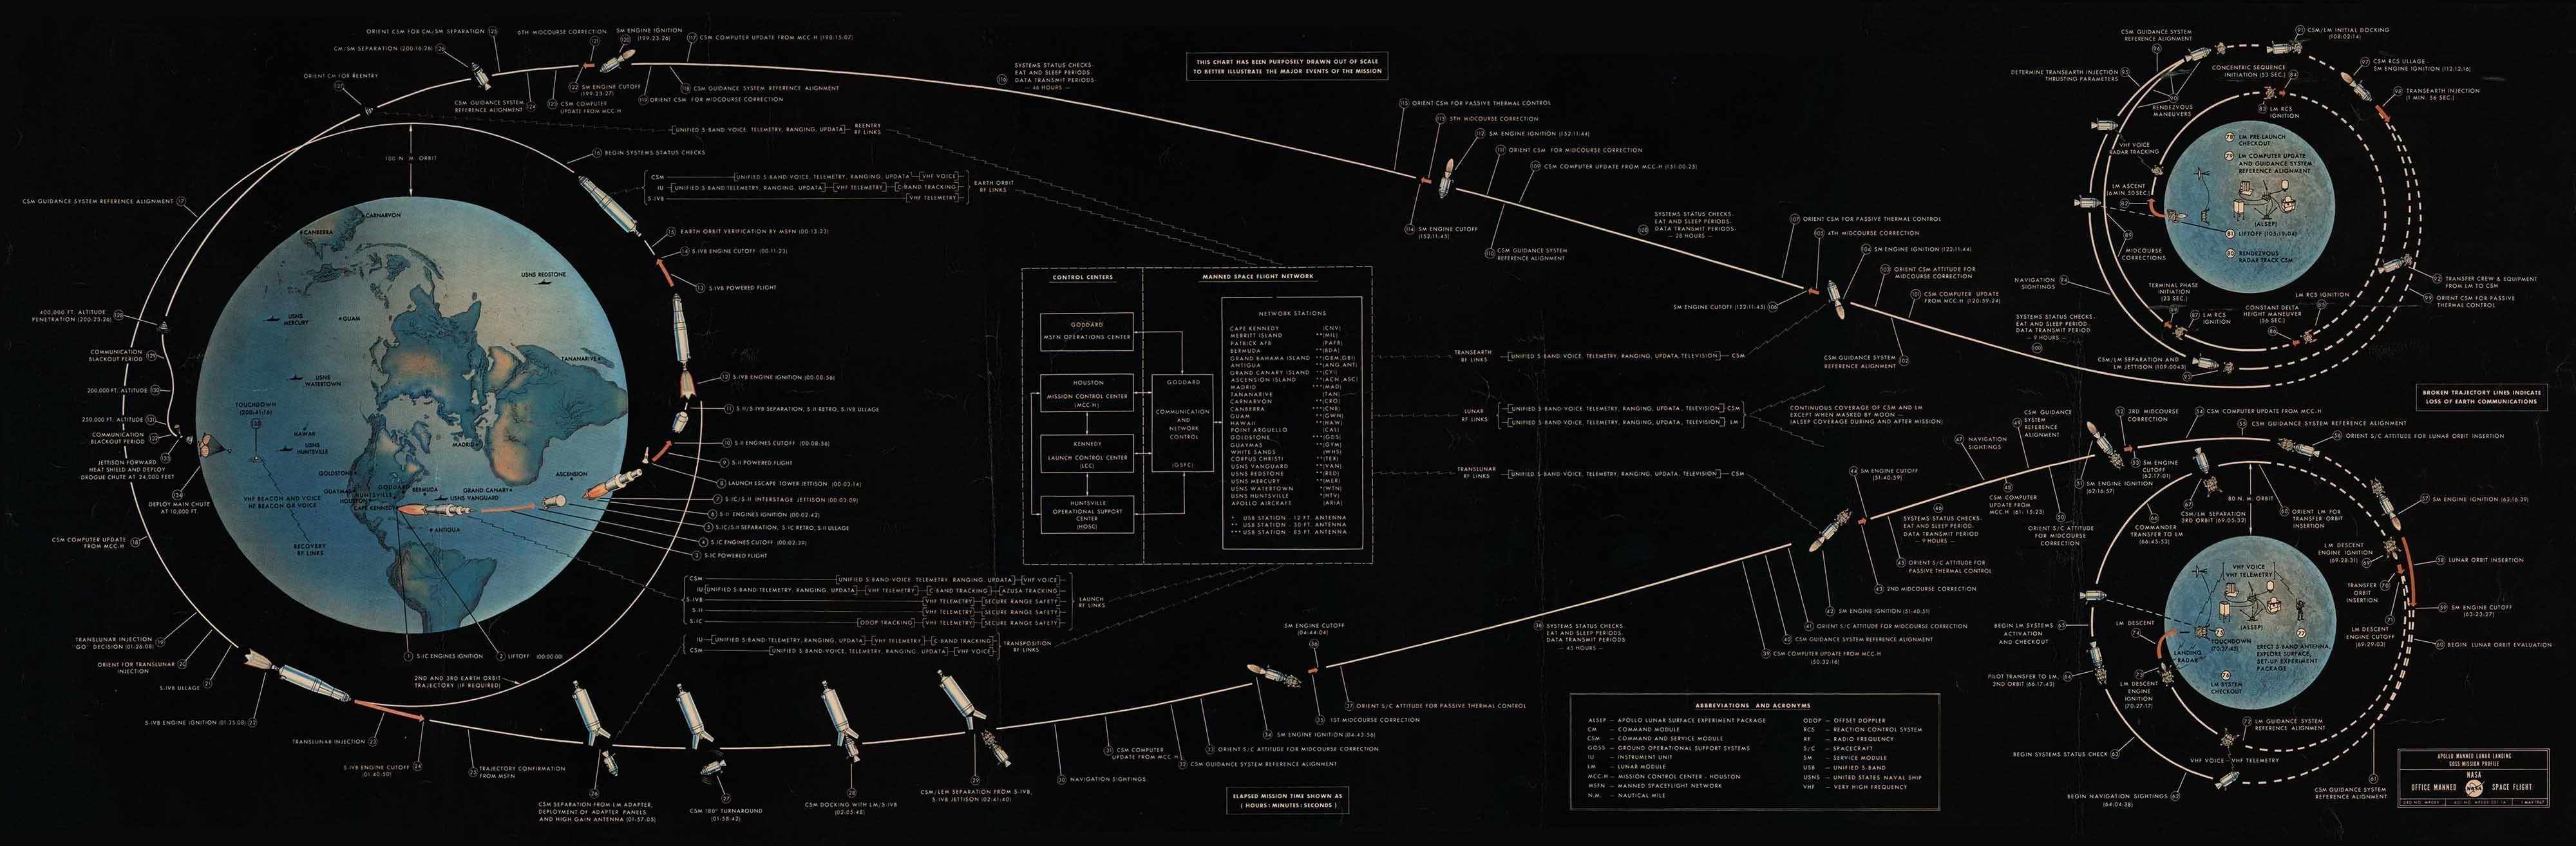 Lunar Landing Mission Profile Chart Apollo Missions